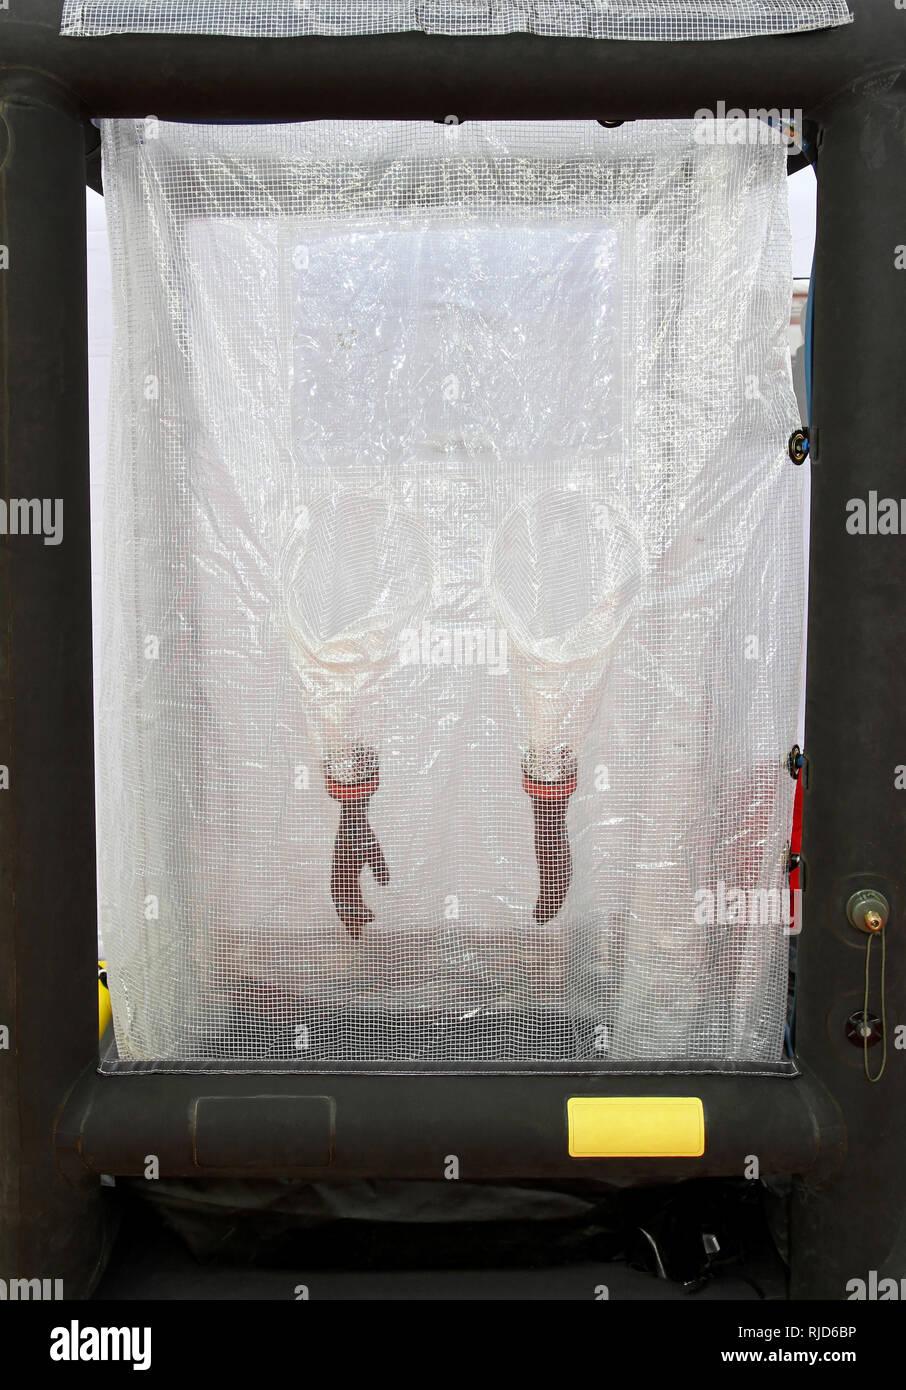 Emergency situations equipment Bio hazard wash station - Stock Image